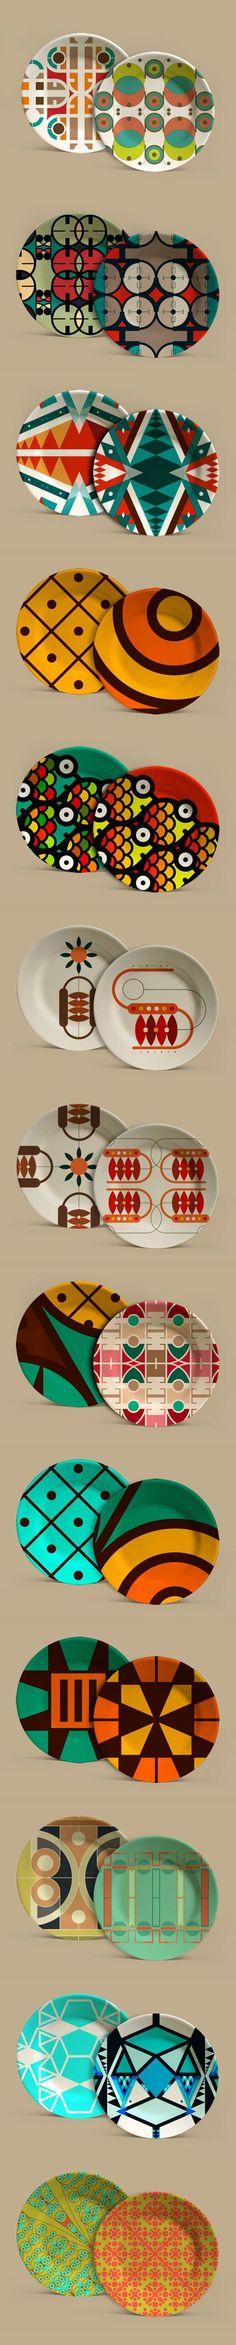 Aplicaciones: Crónicas Visuales del Abya Yala by Vanessa Zúñiga Glass Ceramic, Ceramic Plates, Porcelain Ceramics, Ceramic Pottery, Ceramic Art, Geometric Patterns, Textures Patterns, Print Patterns, Pottery Painting